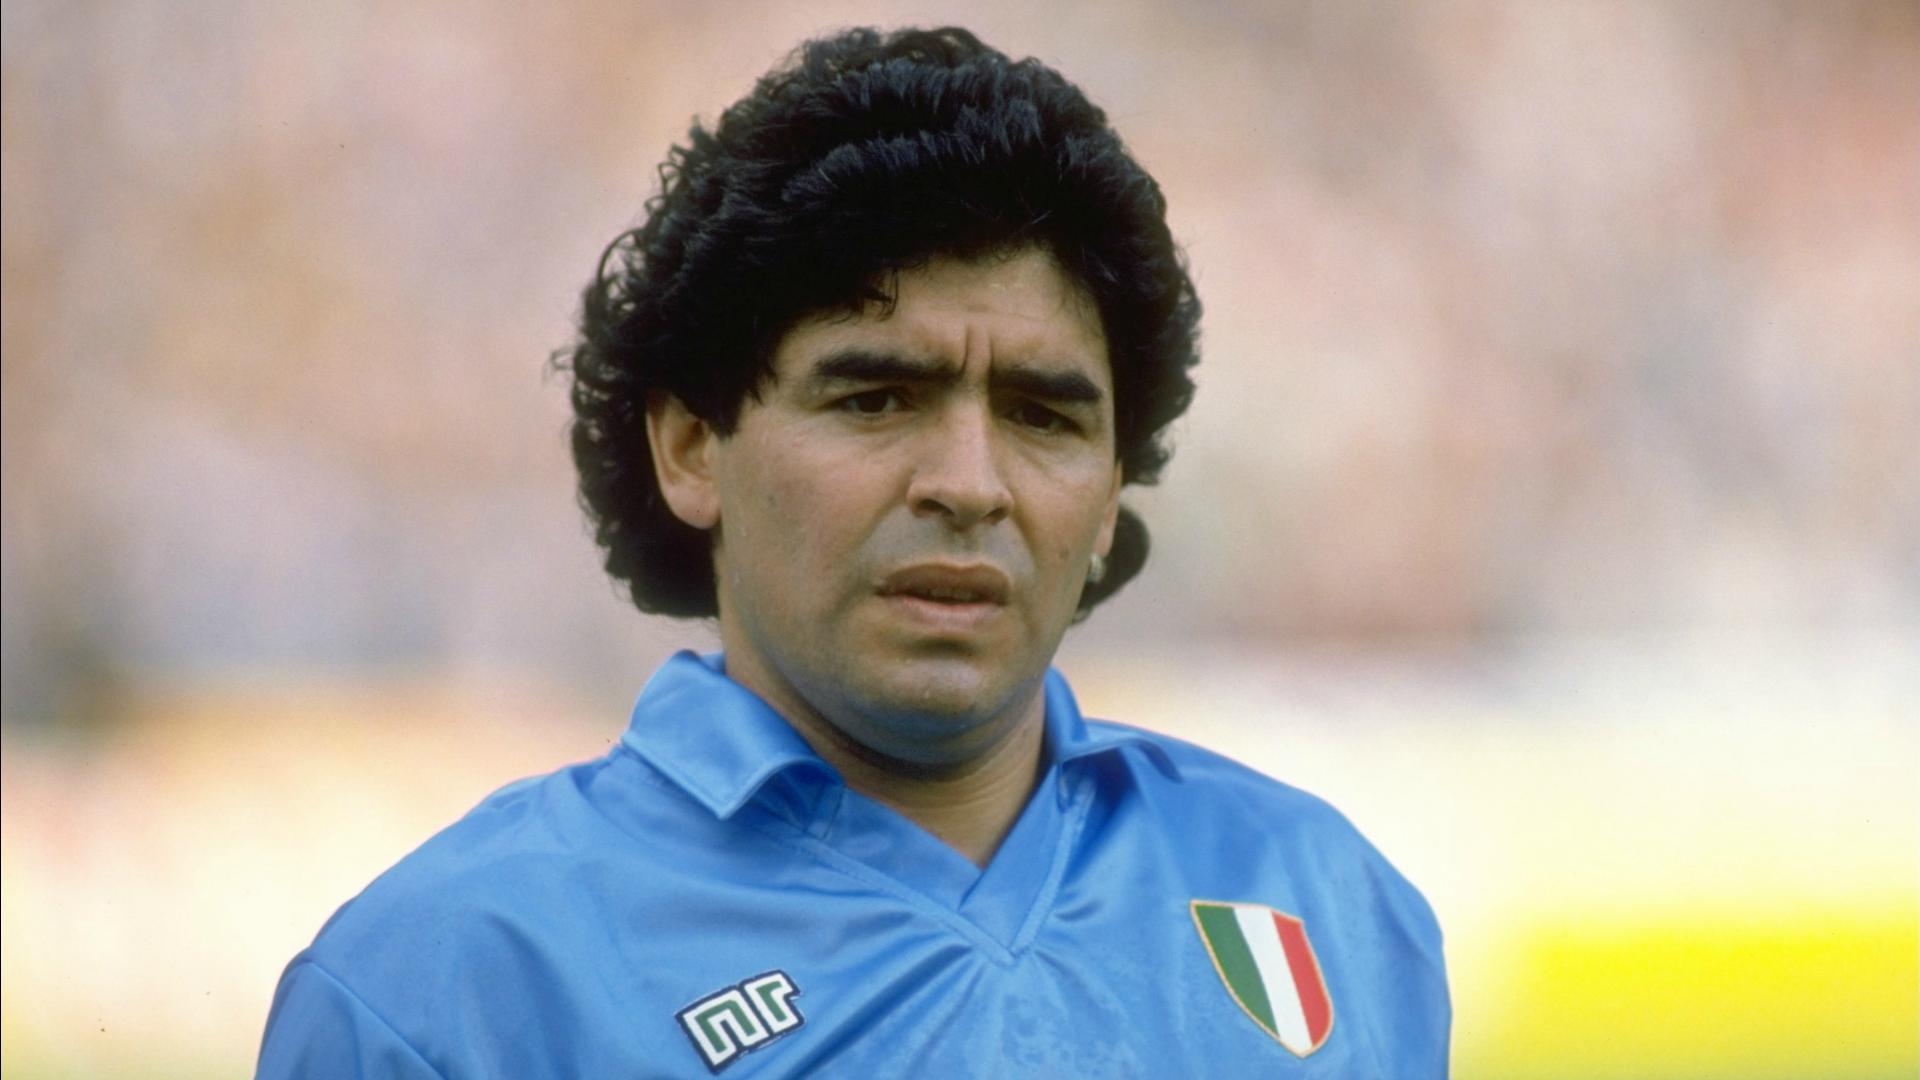 Diego Armando Maradona Napoli 1990-91